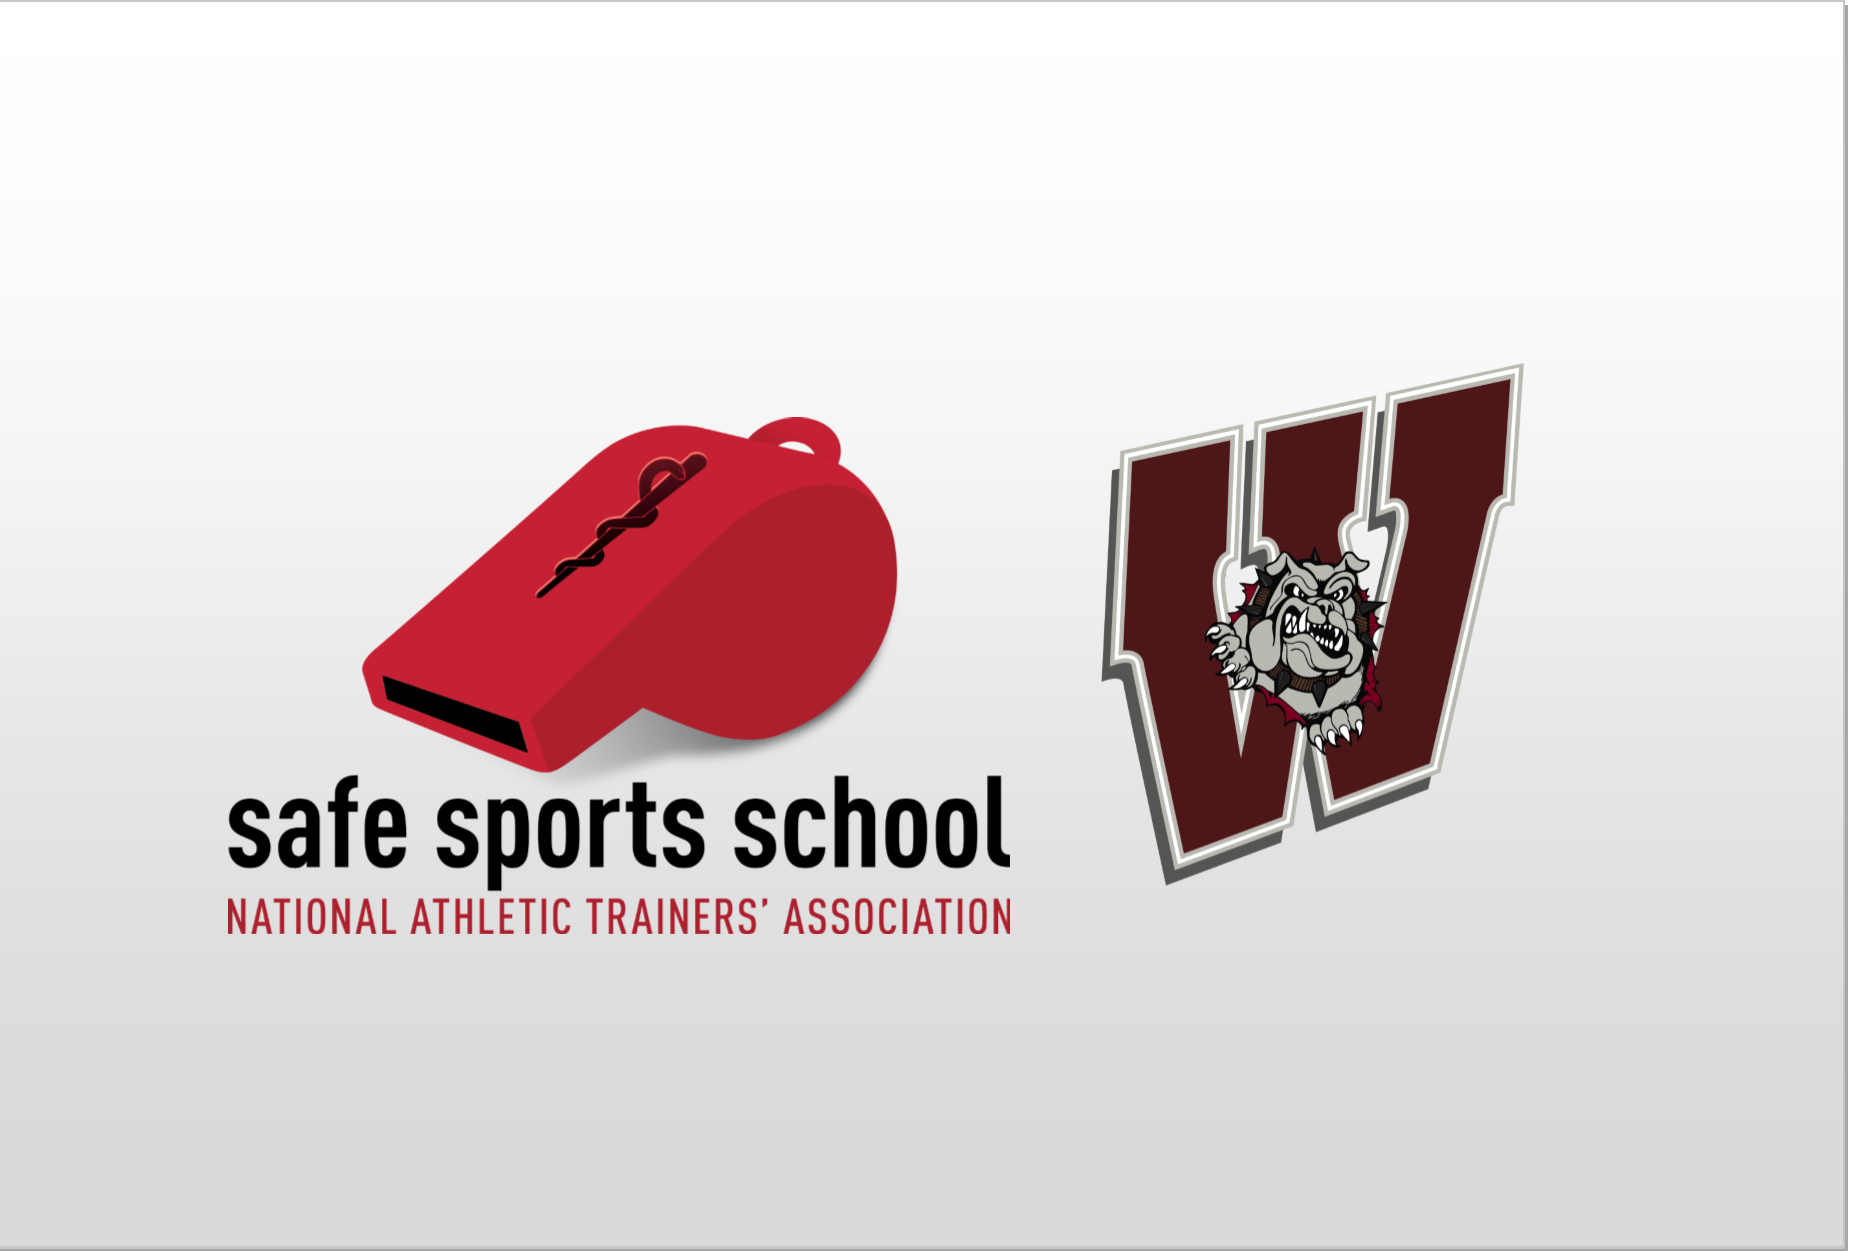 Woodridge High School Receives Safe Sports School Award